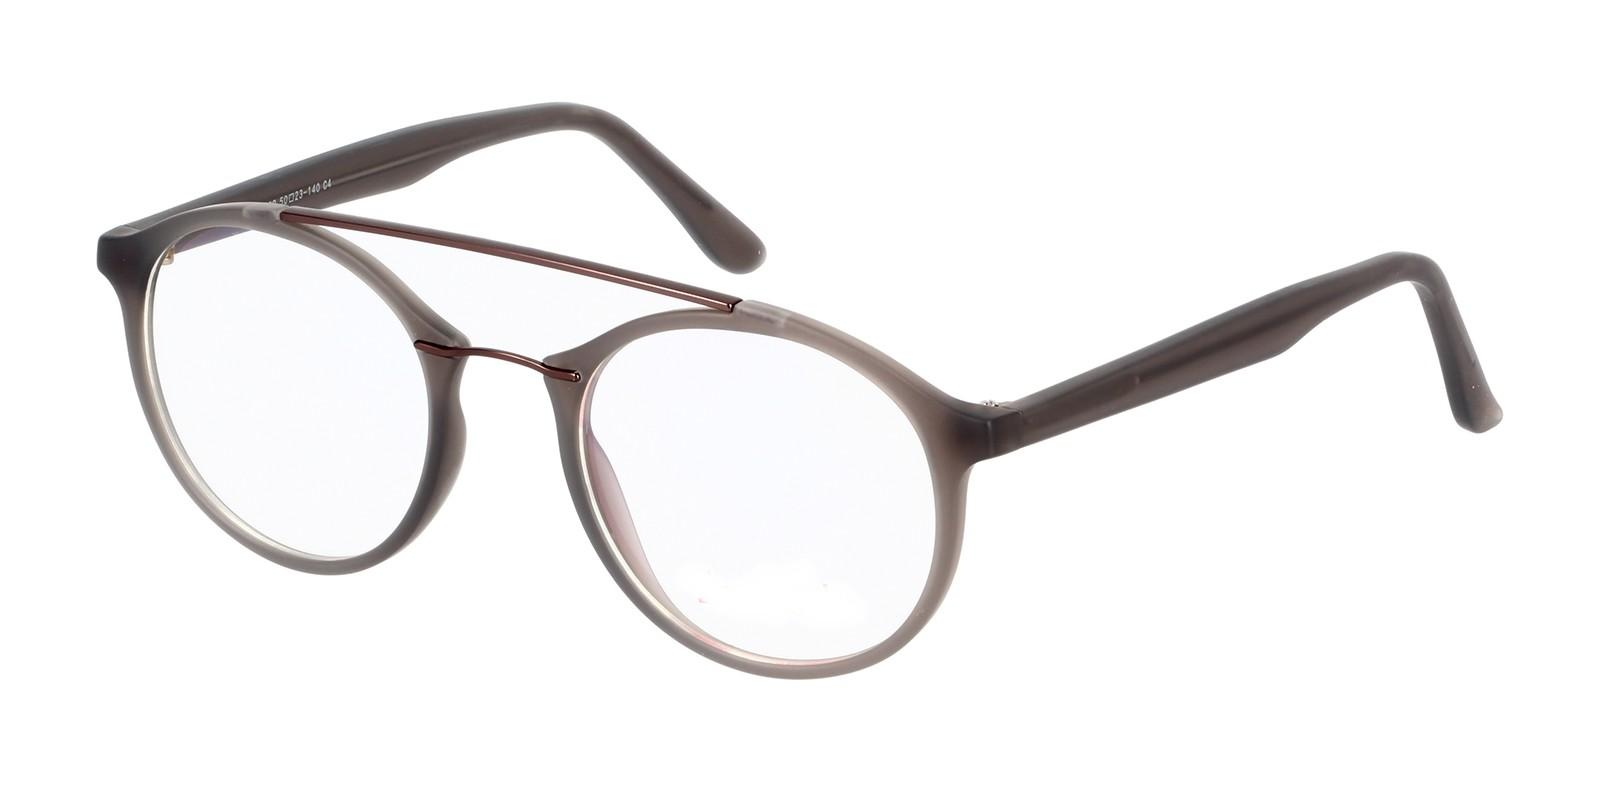 Glen sinise valguse prillid